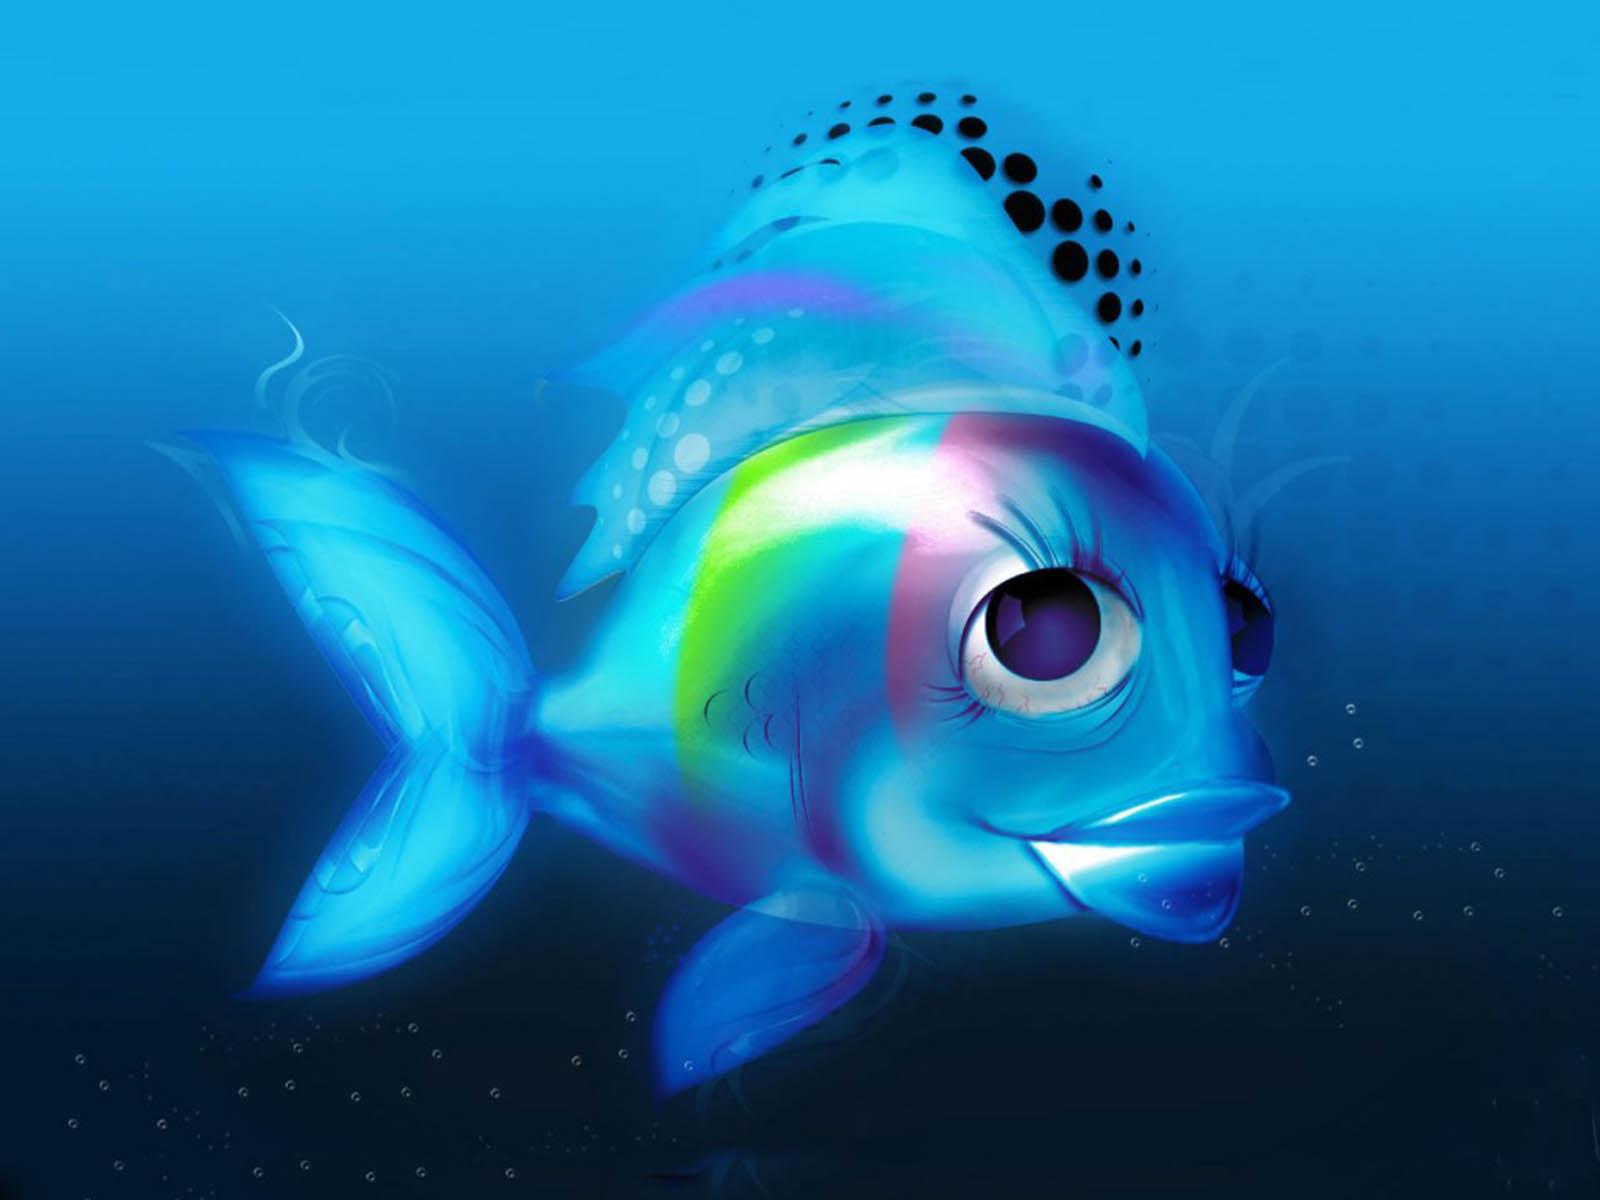 wallpaper: 3D Fish Wallpapers